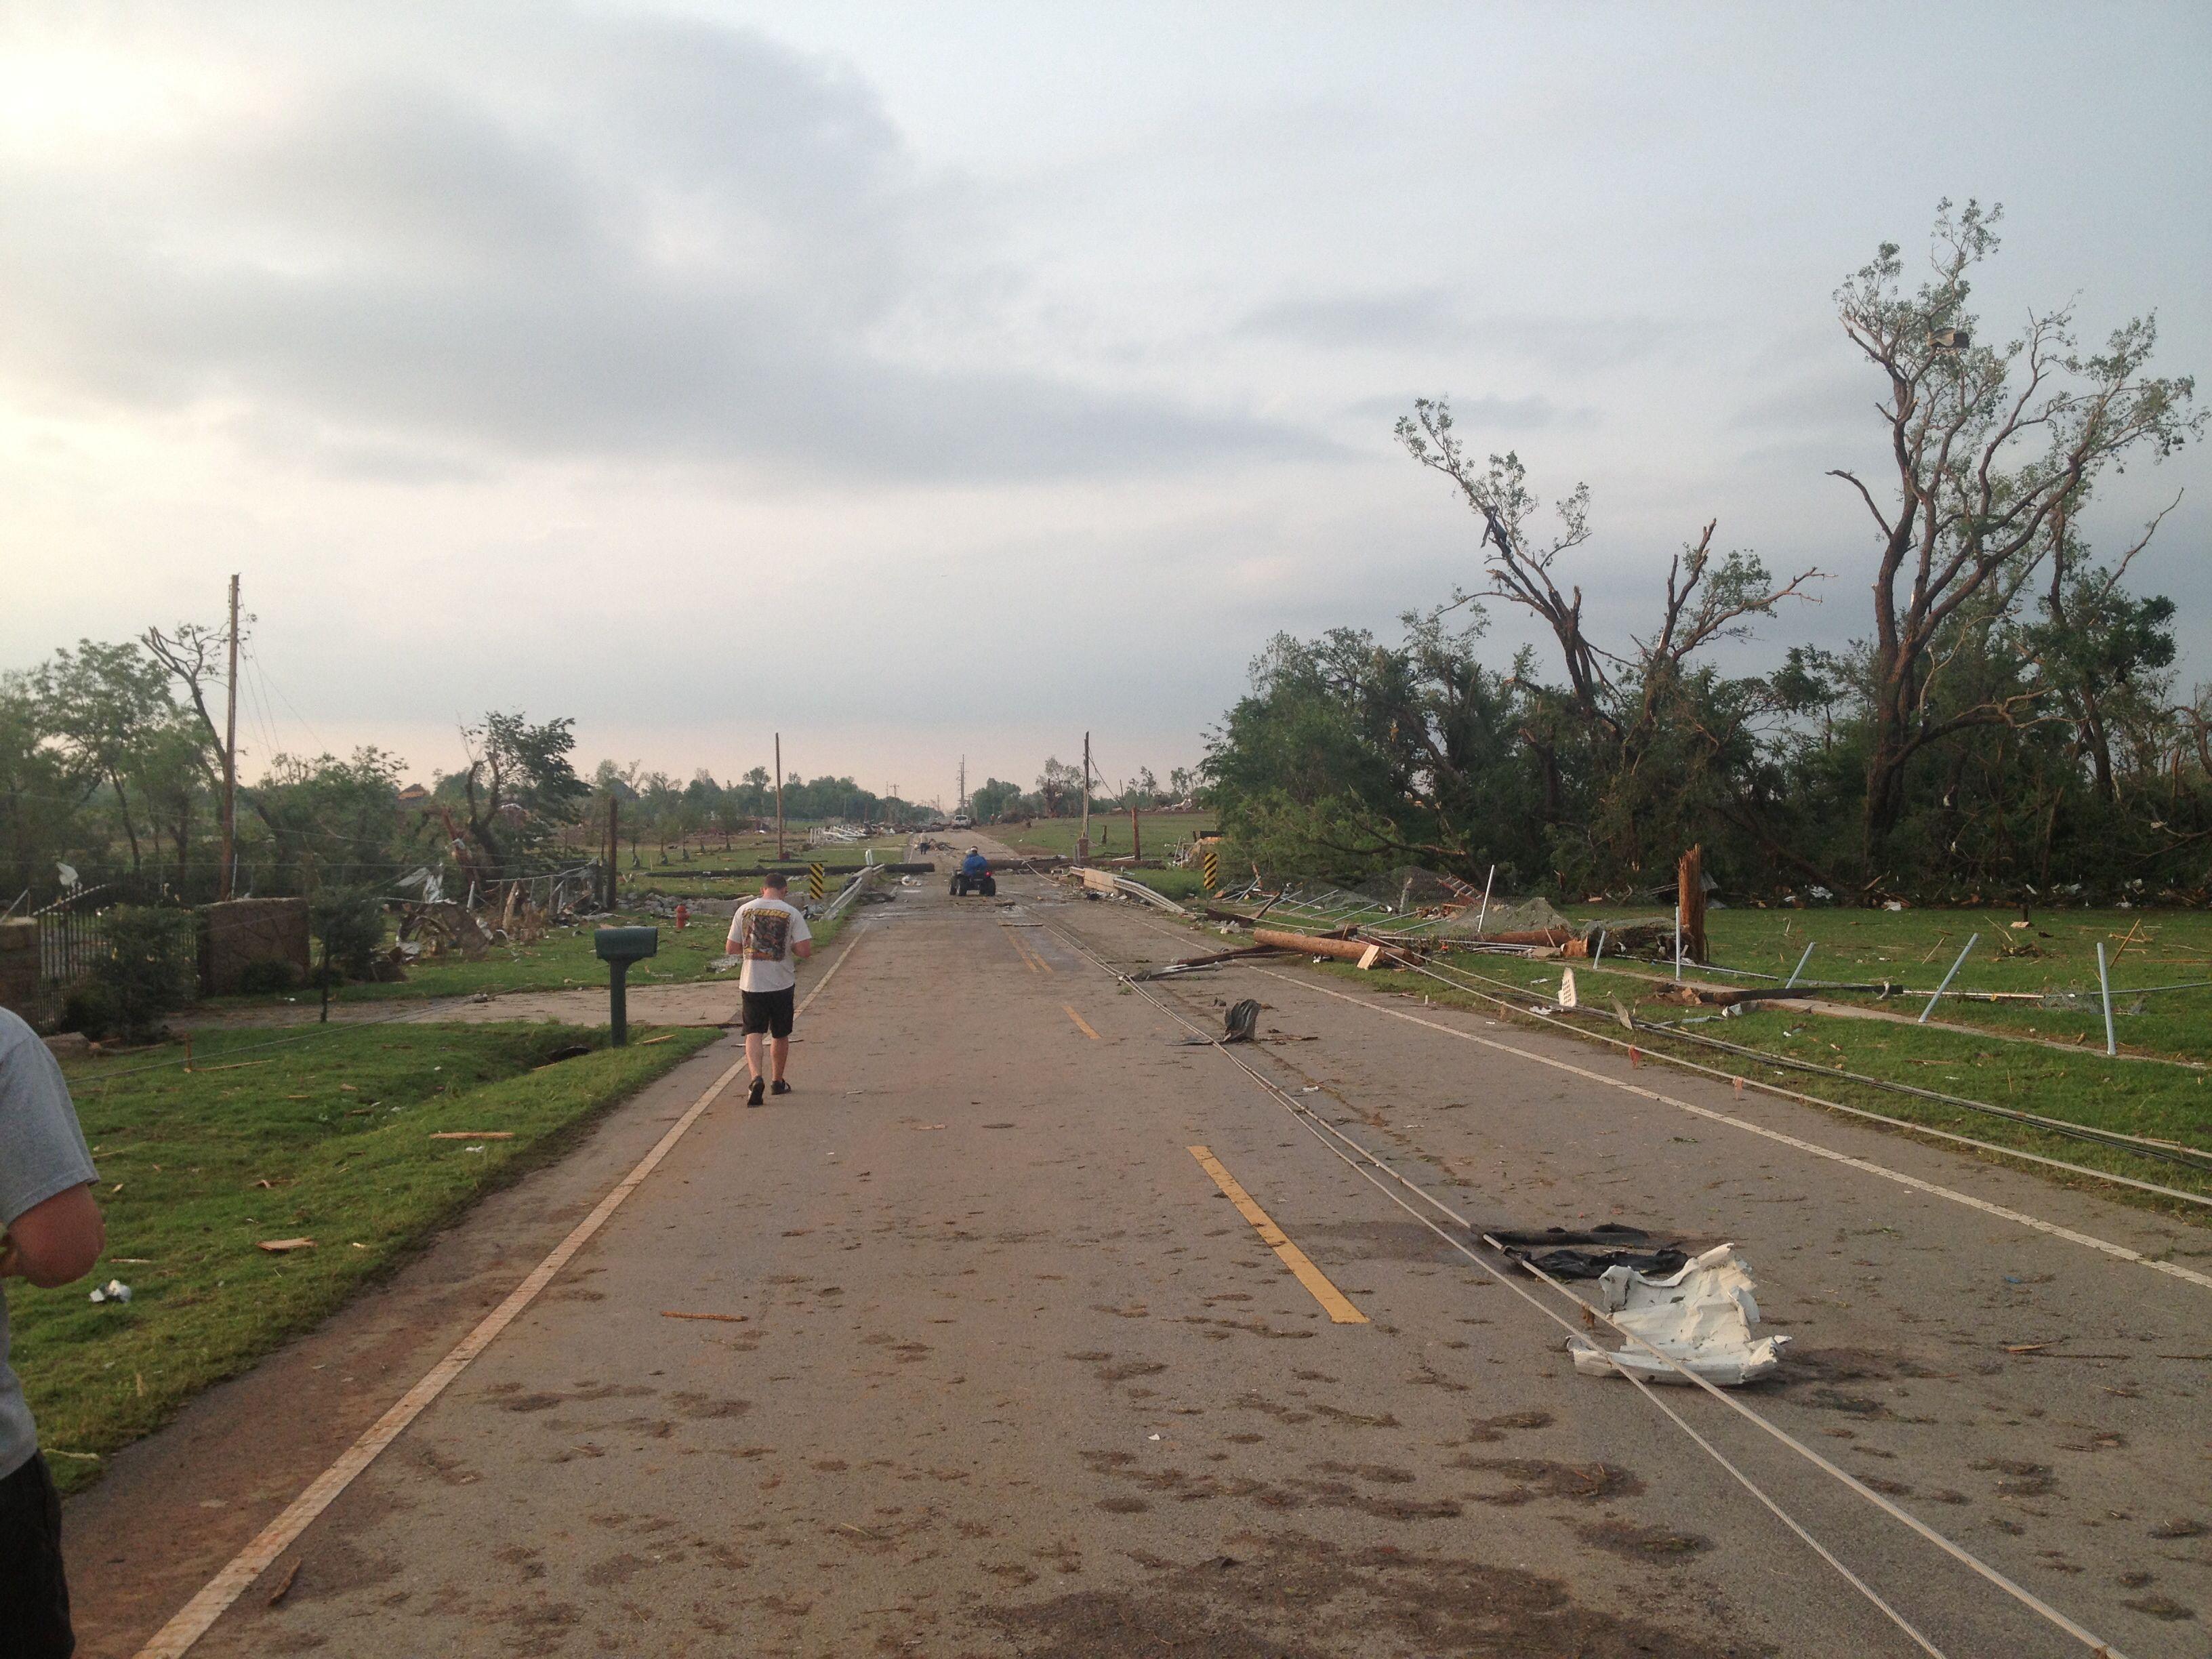 Moore oklahoma tornado south penn avenue 1 hour after 2013